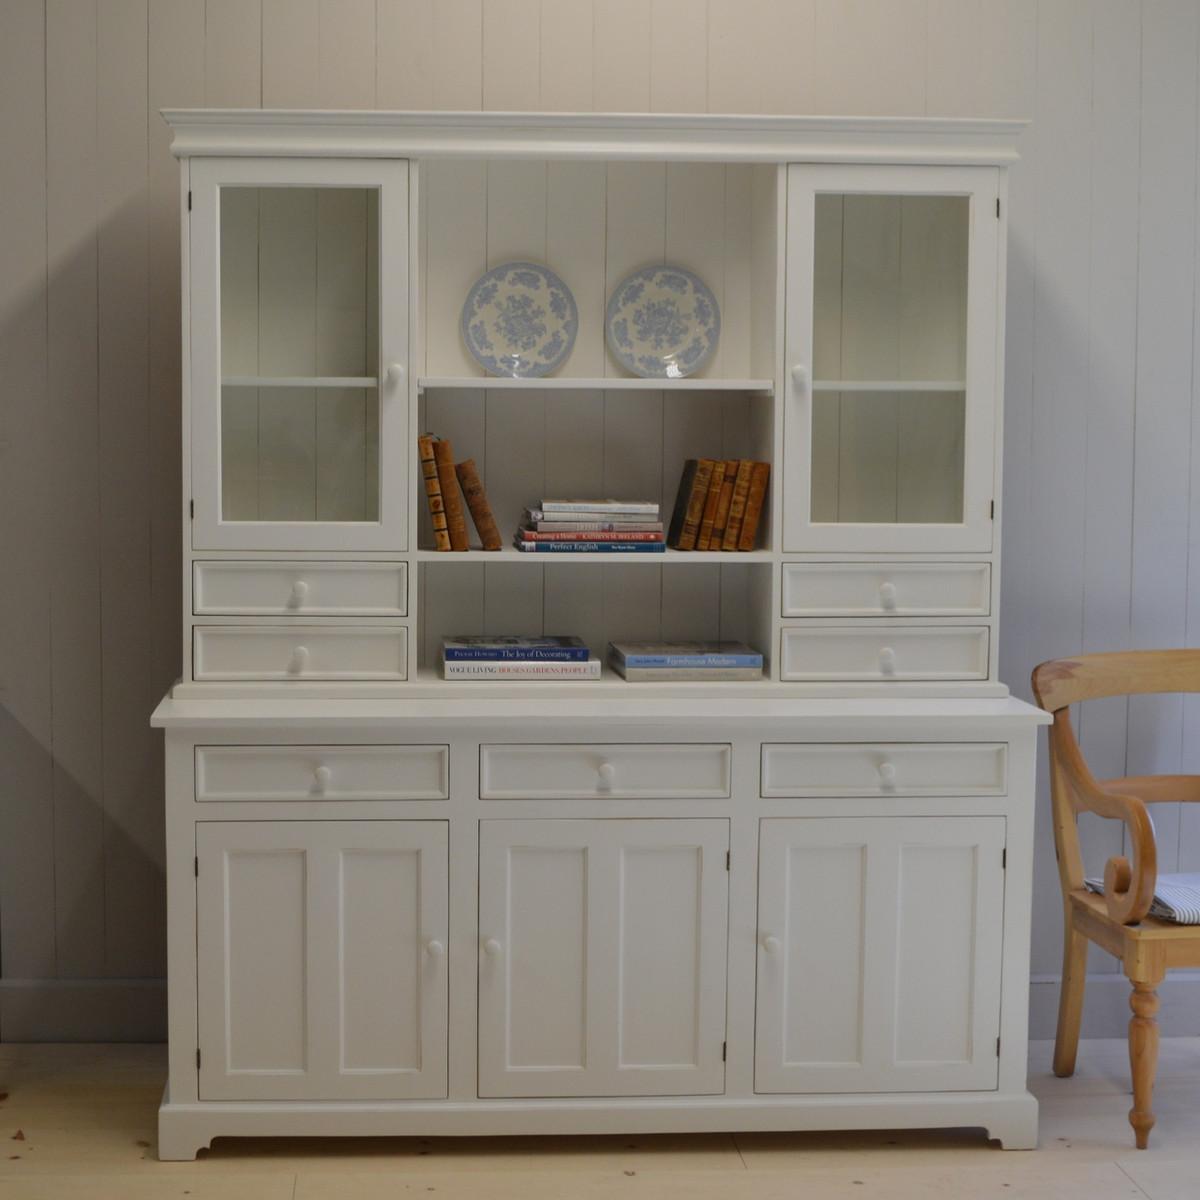 London Kitchen Dresser - white